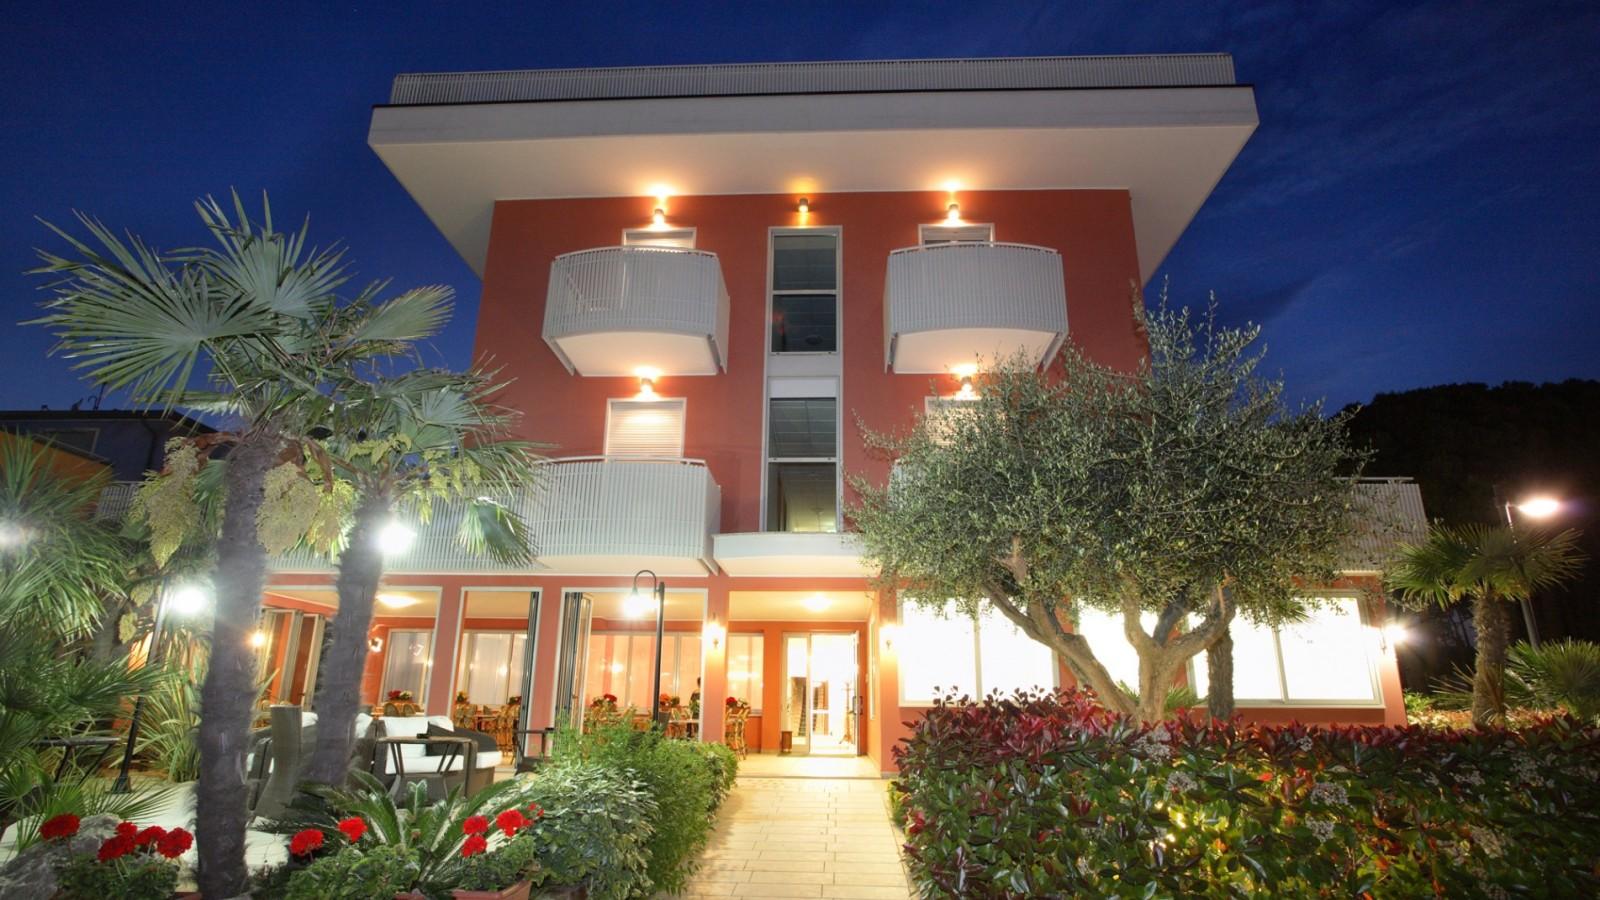 Hotel Villa Maria Caorle Topflight Italian Holidays